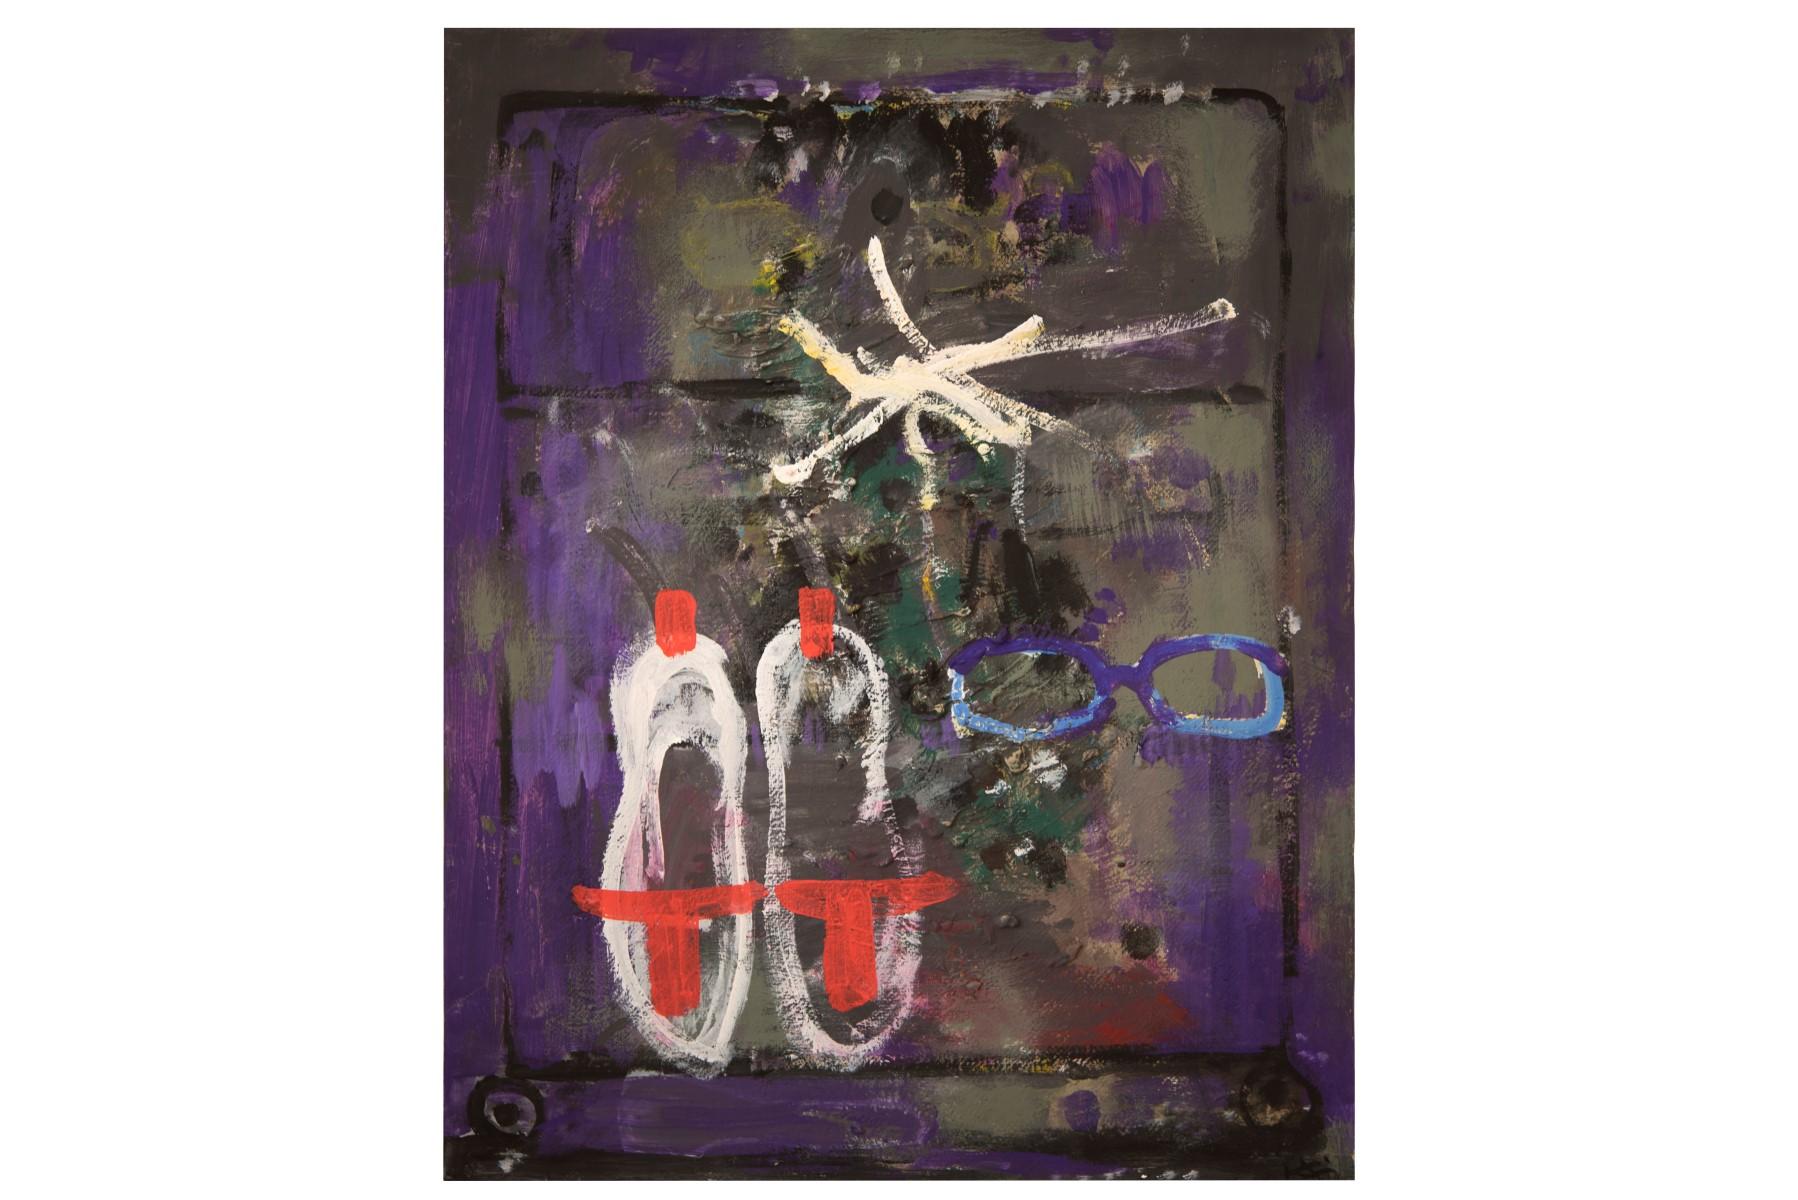 #169 Victor Chernilesvky (1958), Ballet Shoes 2007 | Victor Chernilesvky (1958), Ballet Shoes 2007 Image